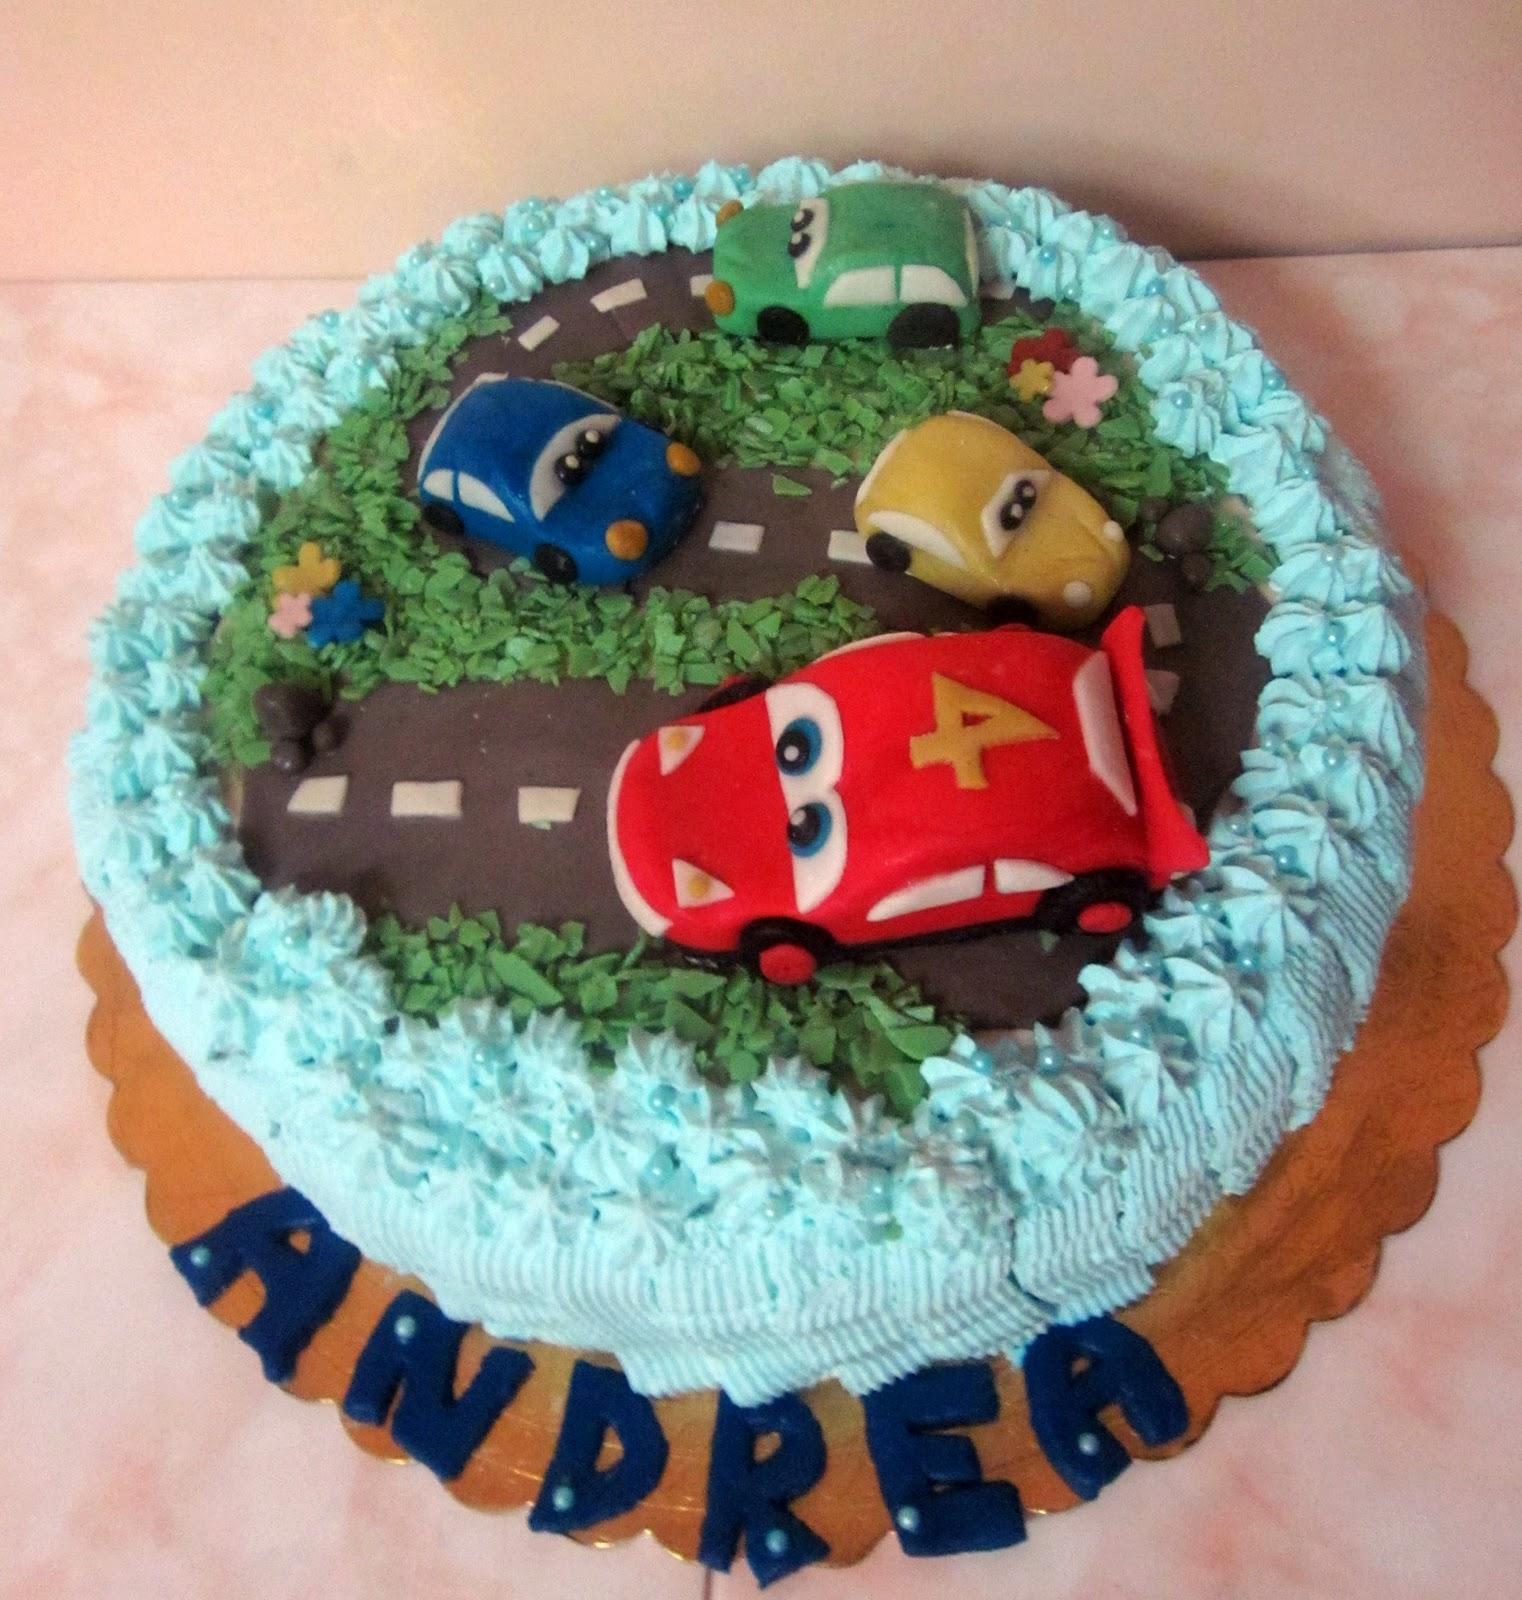 http://2.bp.blogspot.com/-_8EdOa1yqtU/Tw17D9Dfp5I/AAAAAAAAA7o/gj6FGkaVIsk/s1600/Torta+cars2.jpg